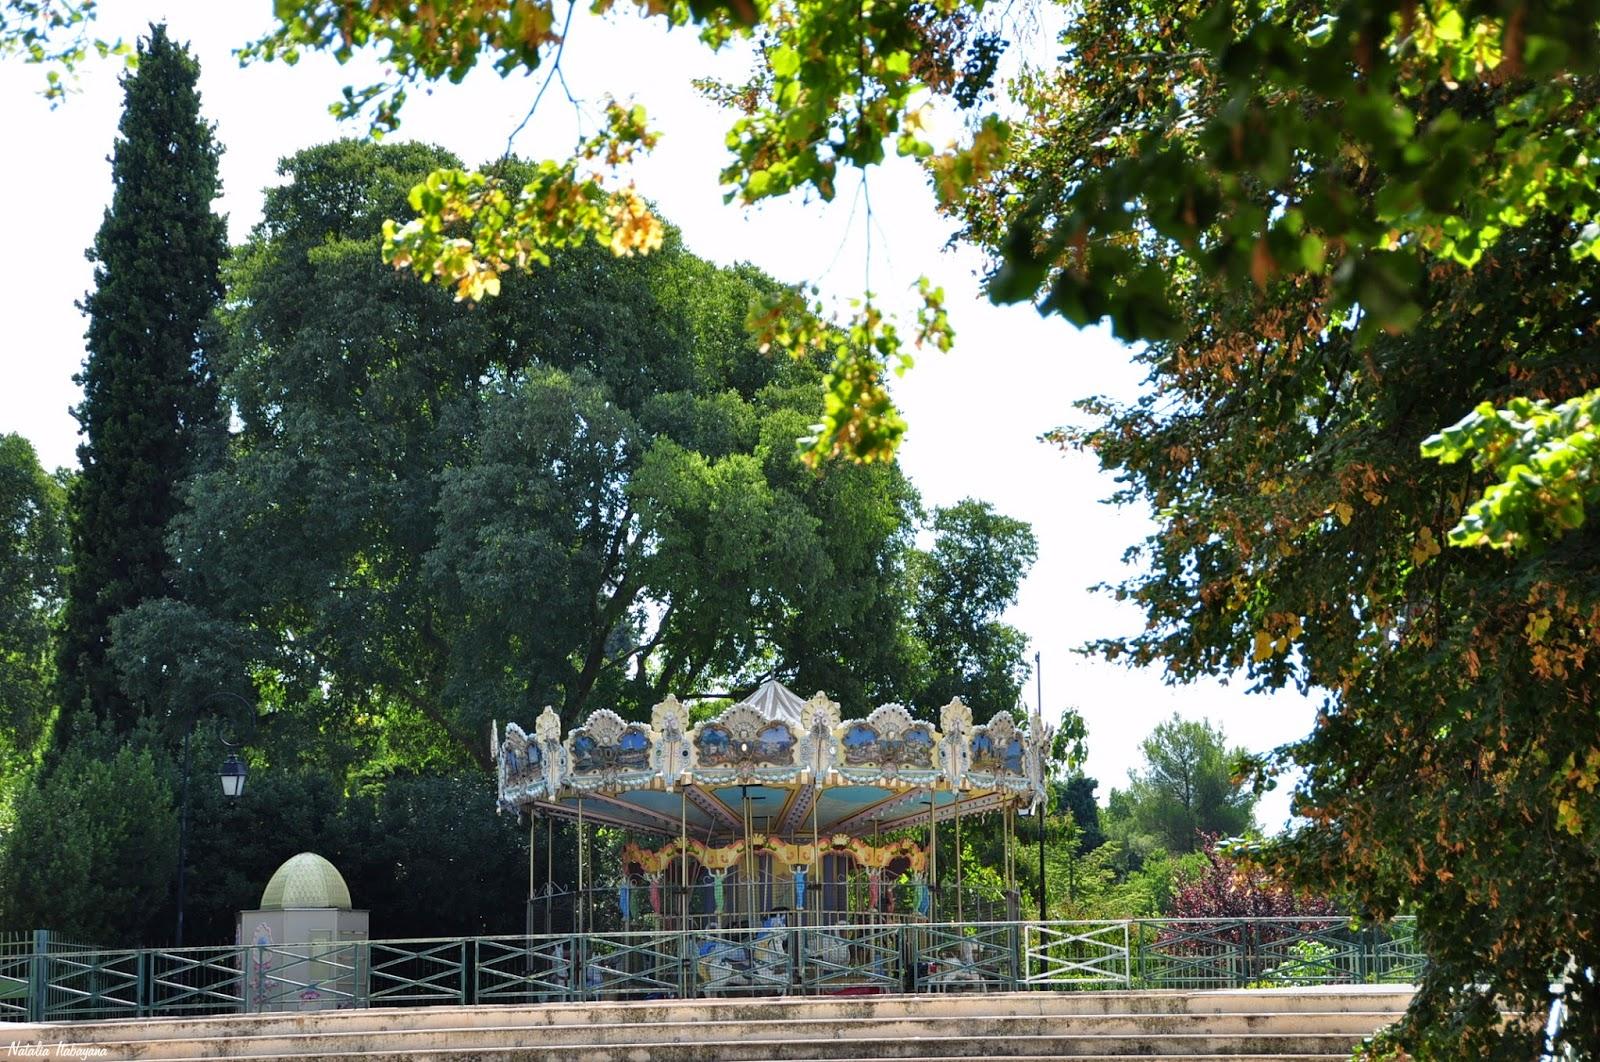 Parques e jardins onde fazer piquenique em aix en provence destino provence - Parc jourdan aix en provence ...